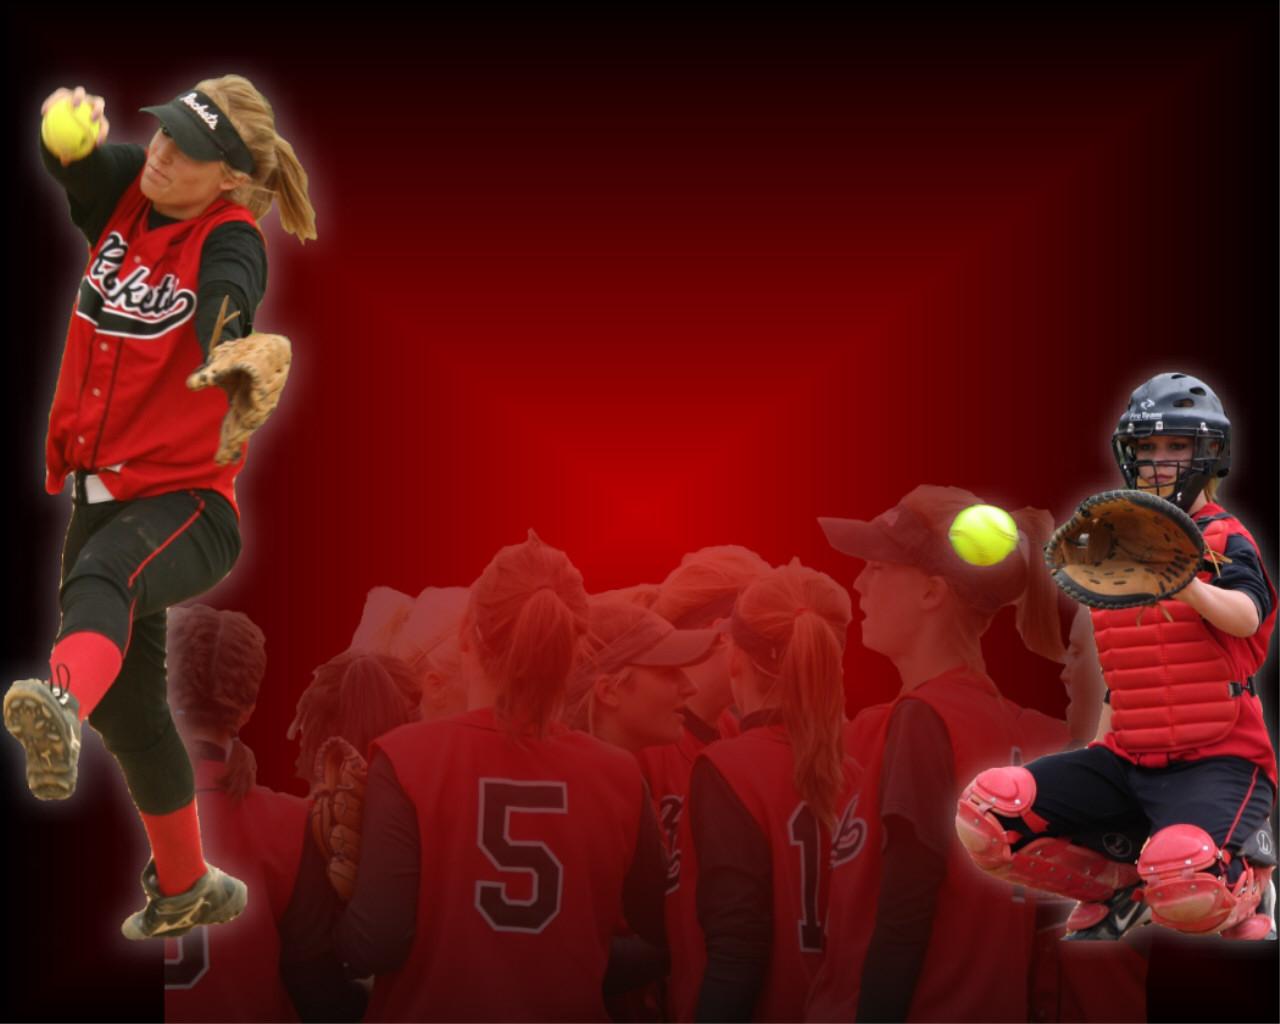 softball quotes desktop wallpaper - photo #4